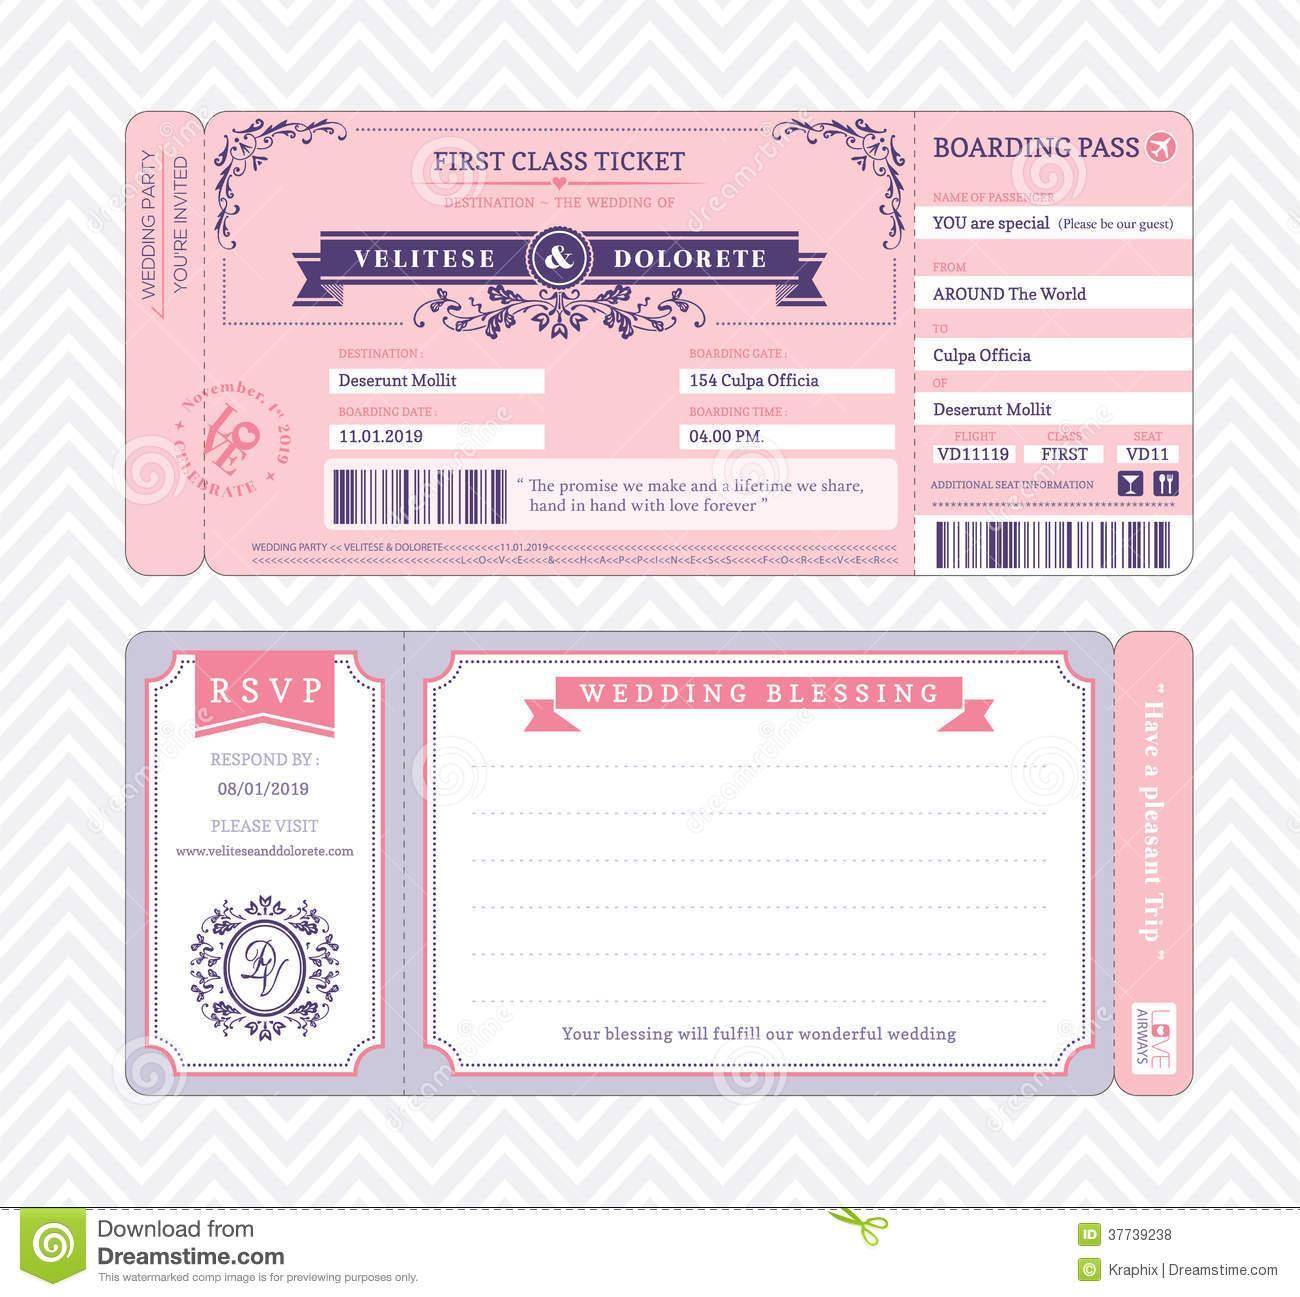 Boarding Pass Wedding Invitation Template Printable